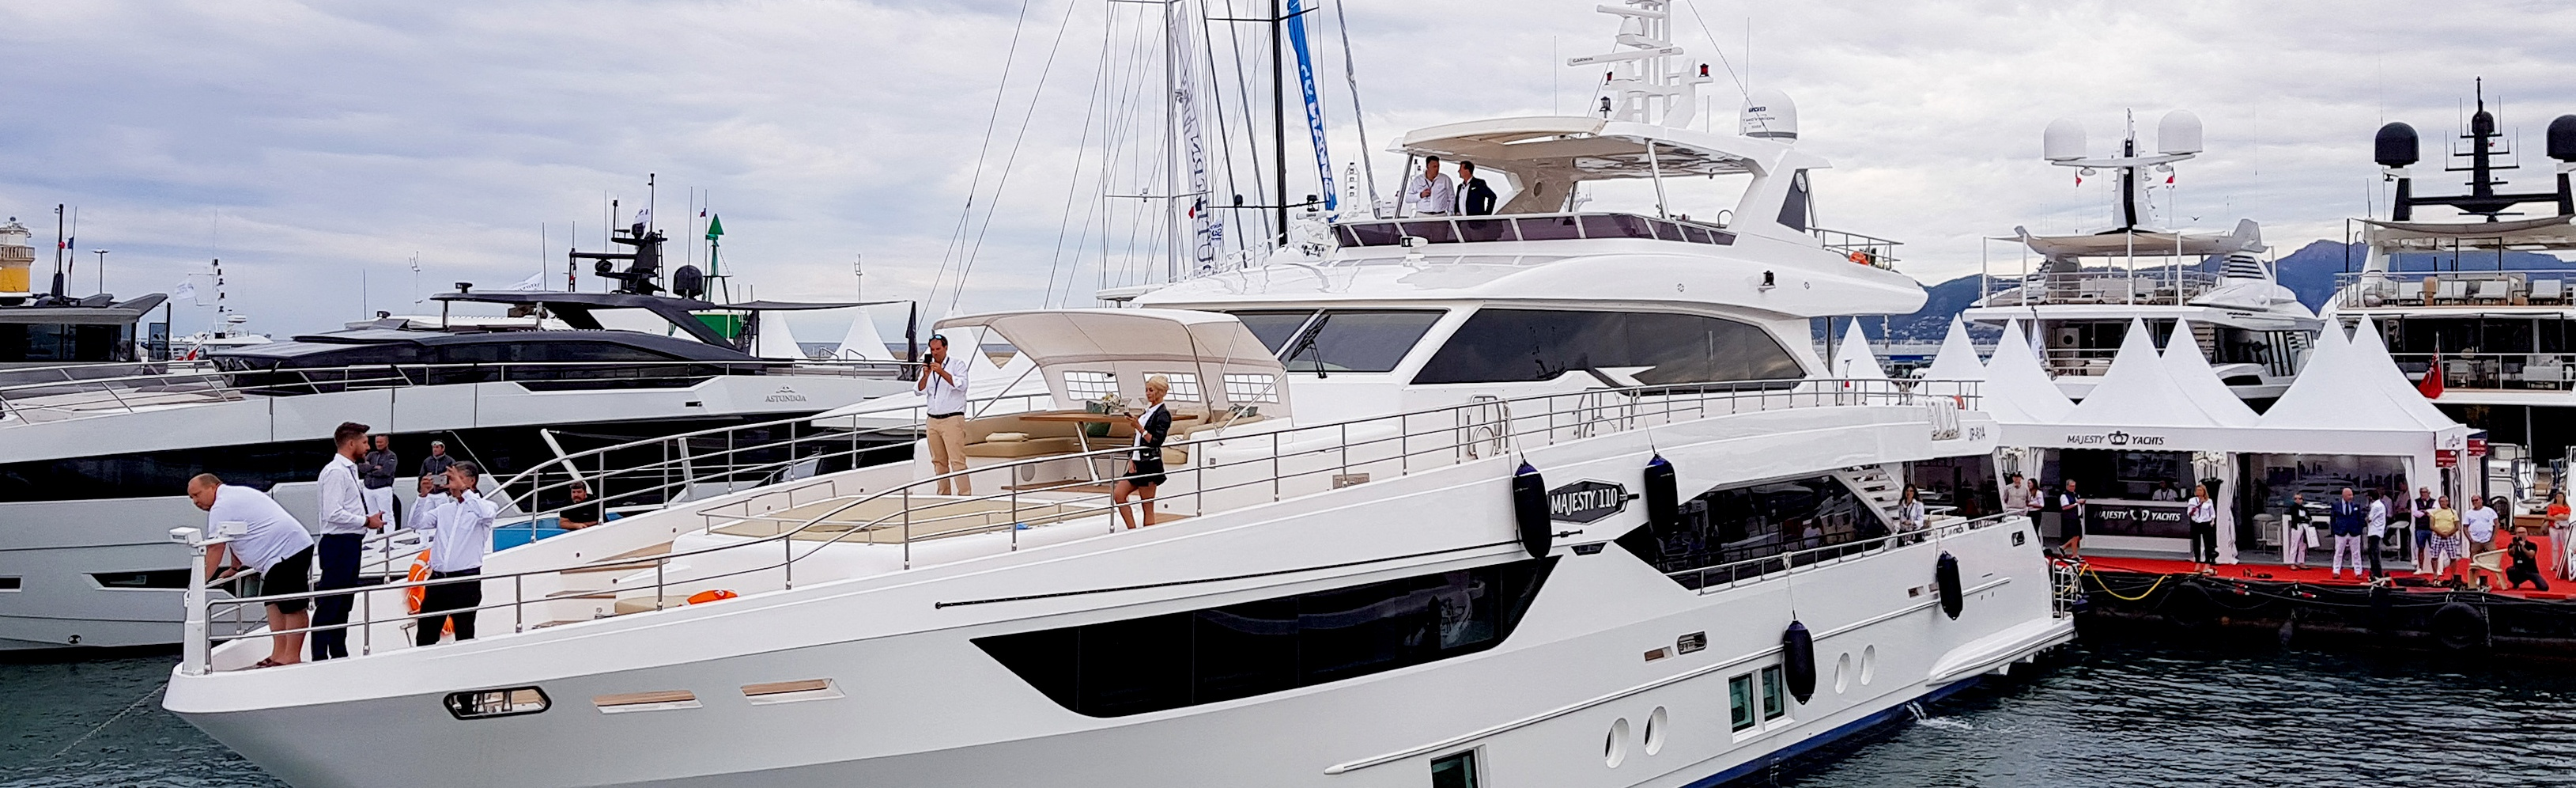 Gulf-Craft,-Cannes-Yachting-Festival.jpg